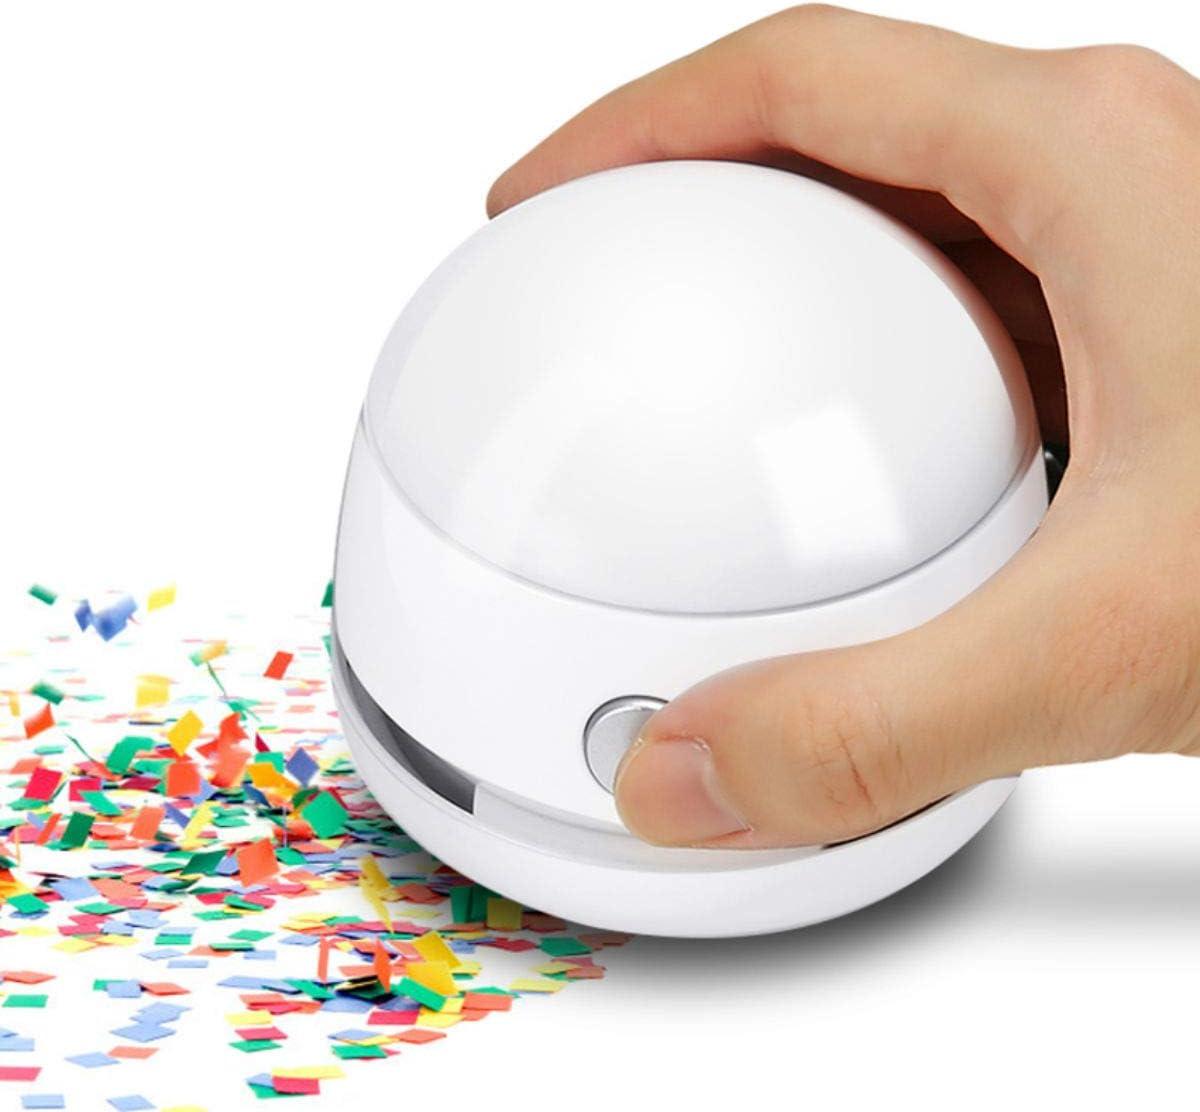 MECO Desktop Vacuum Desk Dust Cleaner Mini Table Dust Vaccum Cleaner, Best Cleaner for Cleaning Dust,Hairs,Crumbs,Scraps for Laptop,Piano,Computer,Car and Pet House